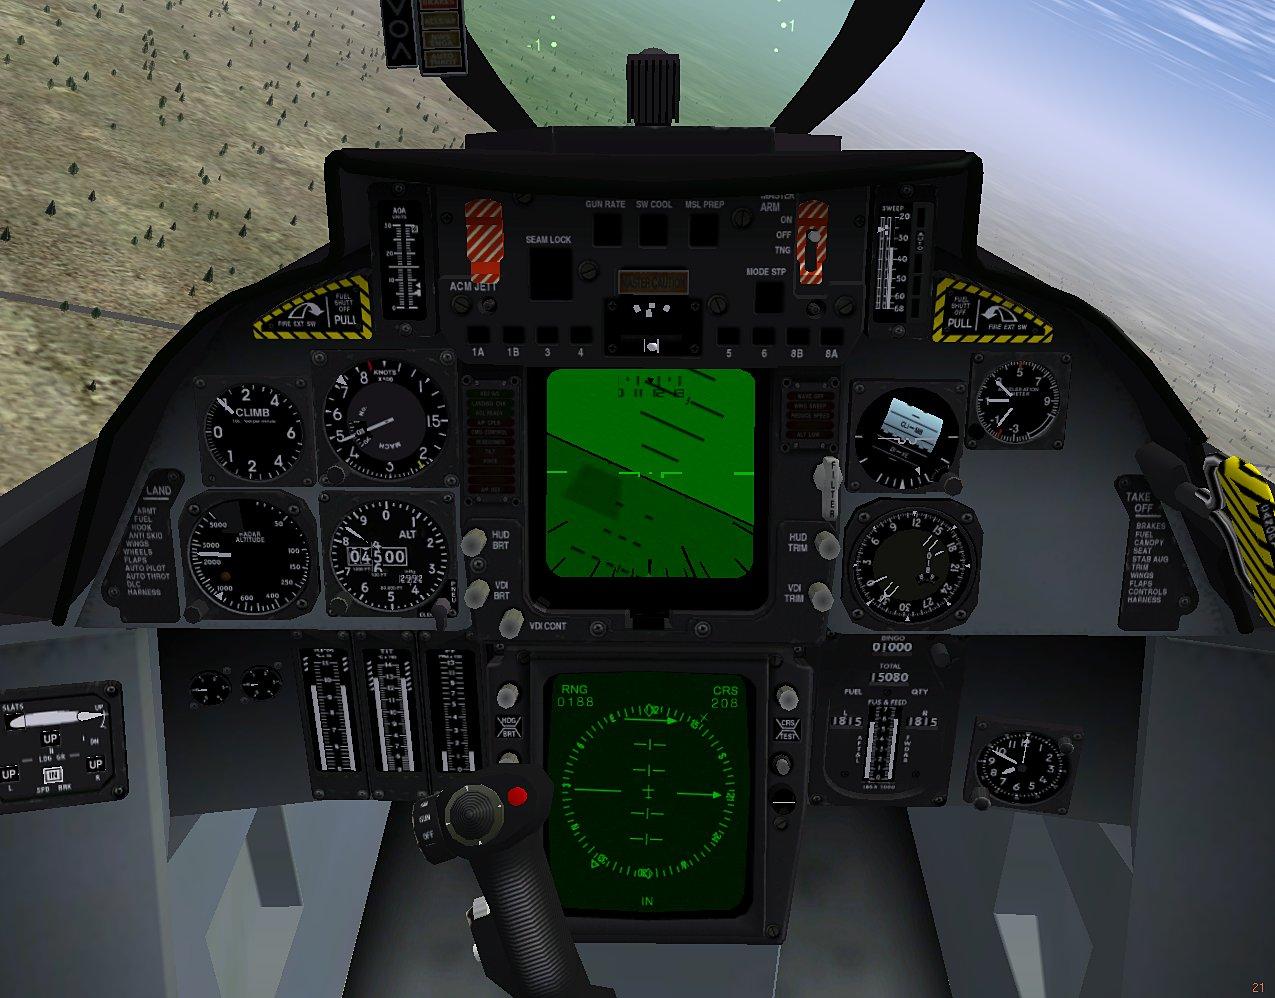 F 14 Tomcat Cockpit File:F-14 cockpit.jpg ...